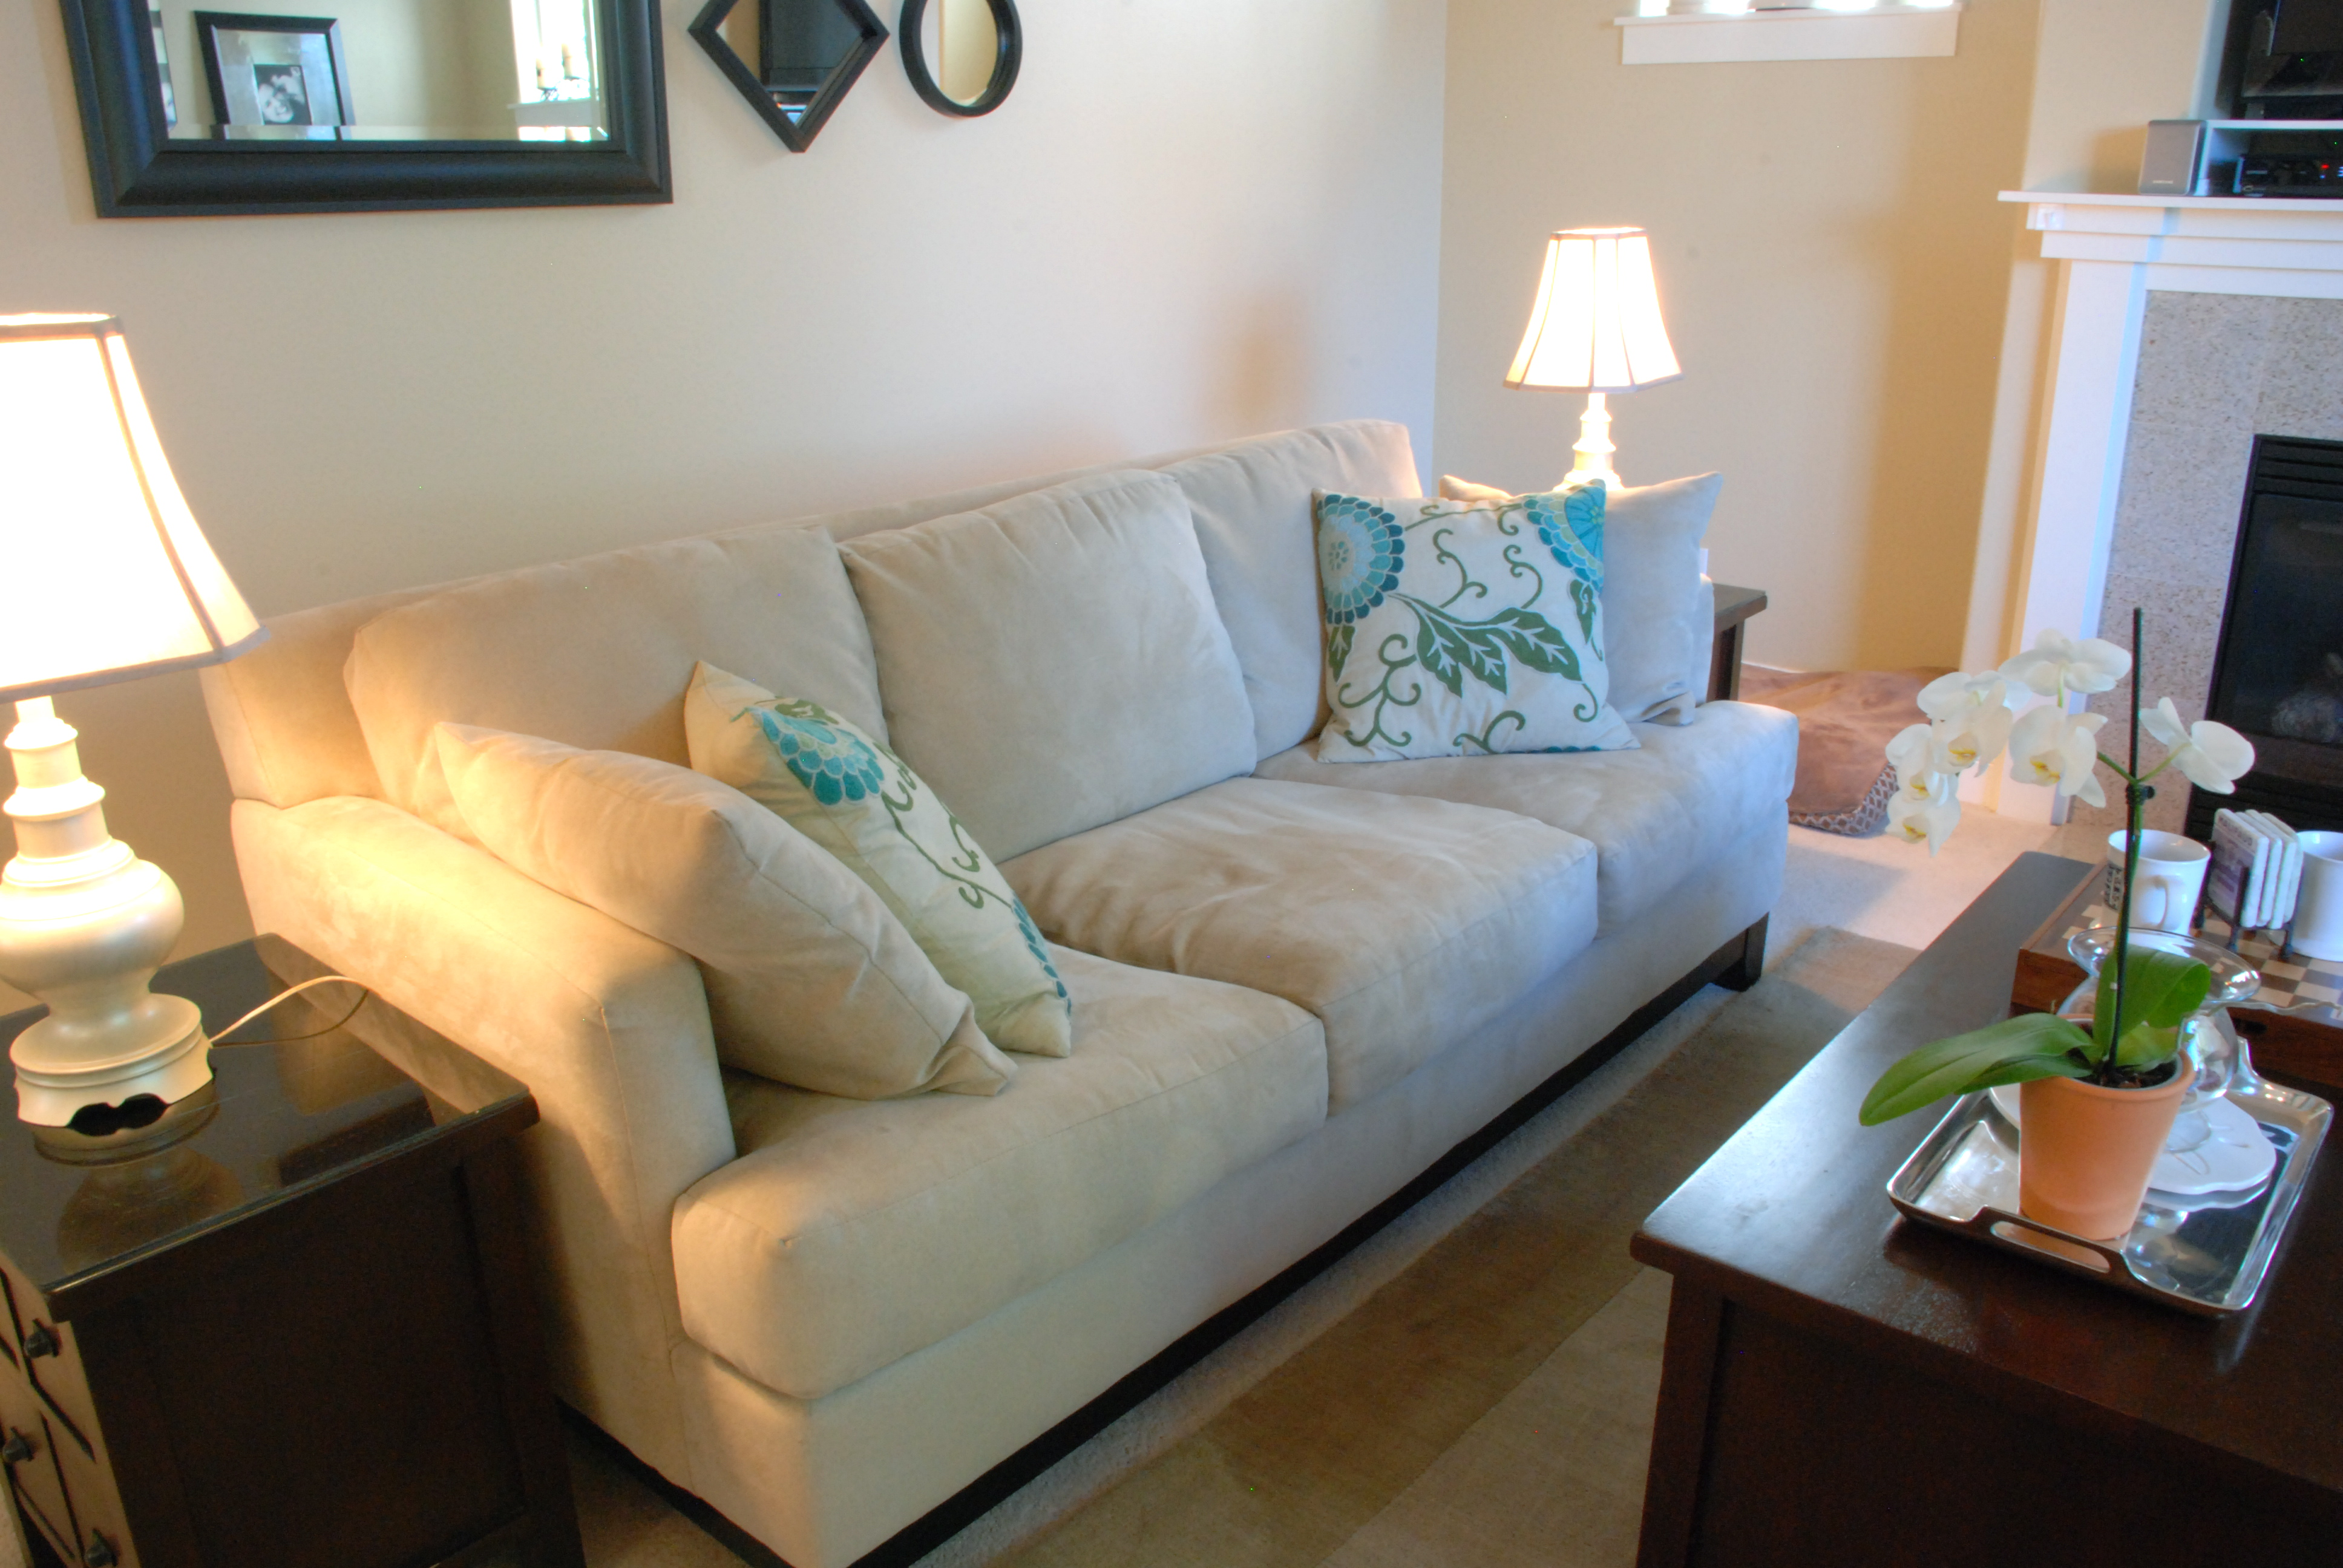 sofa nicole pillows decorative via of miller elegant goods home pillow taupe